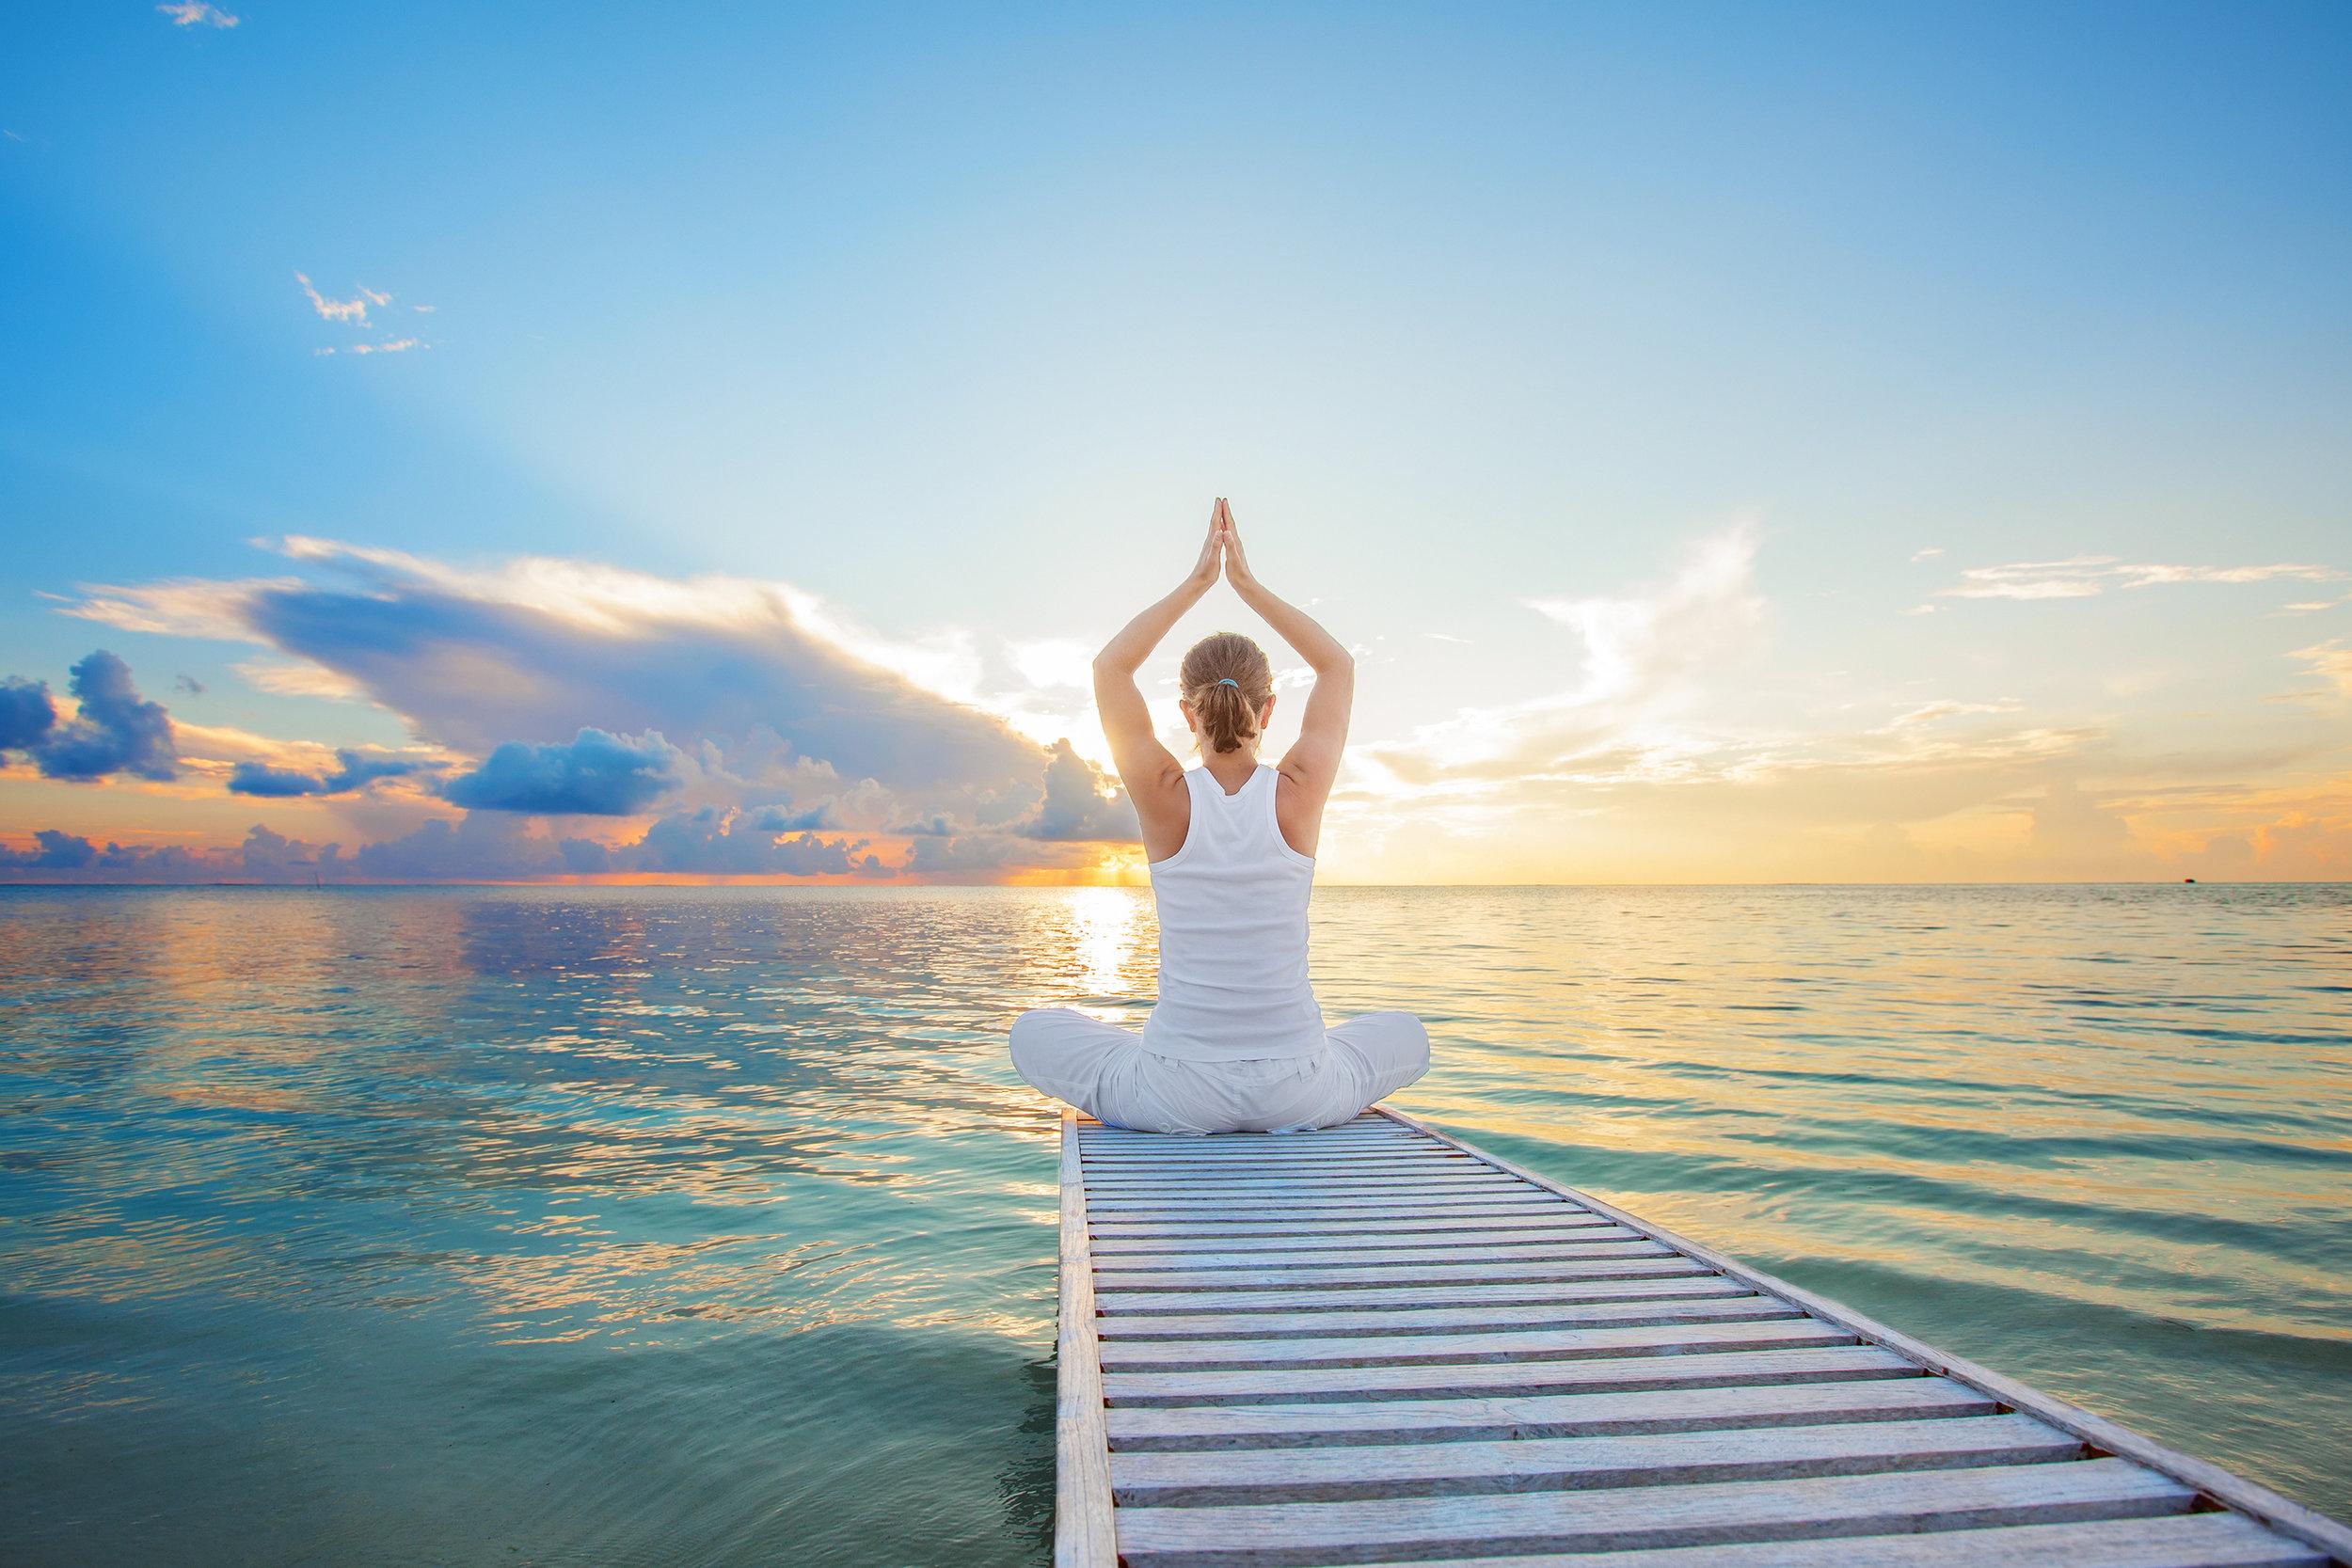 Relax meditate shutterstock_154425812.jpg